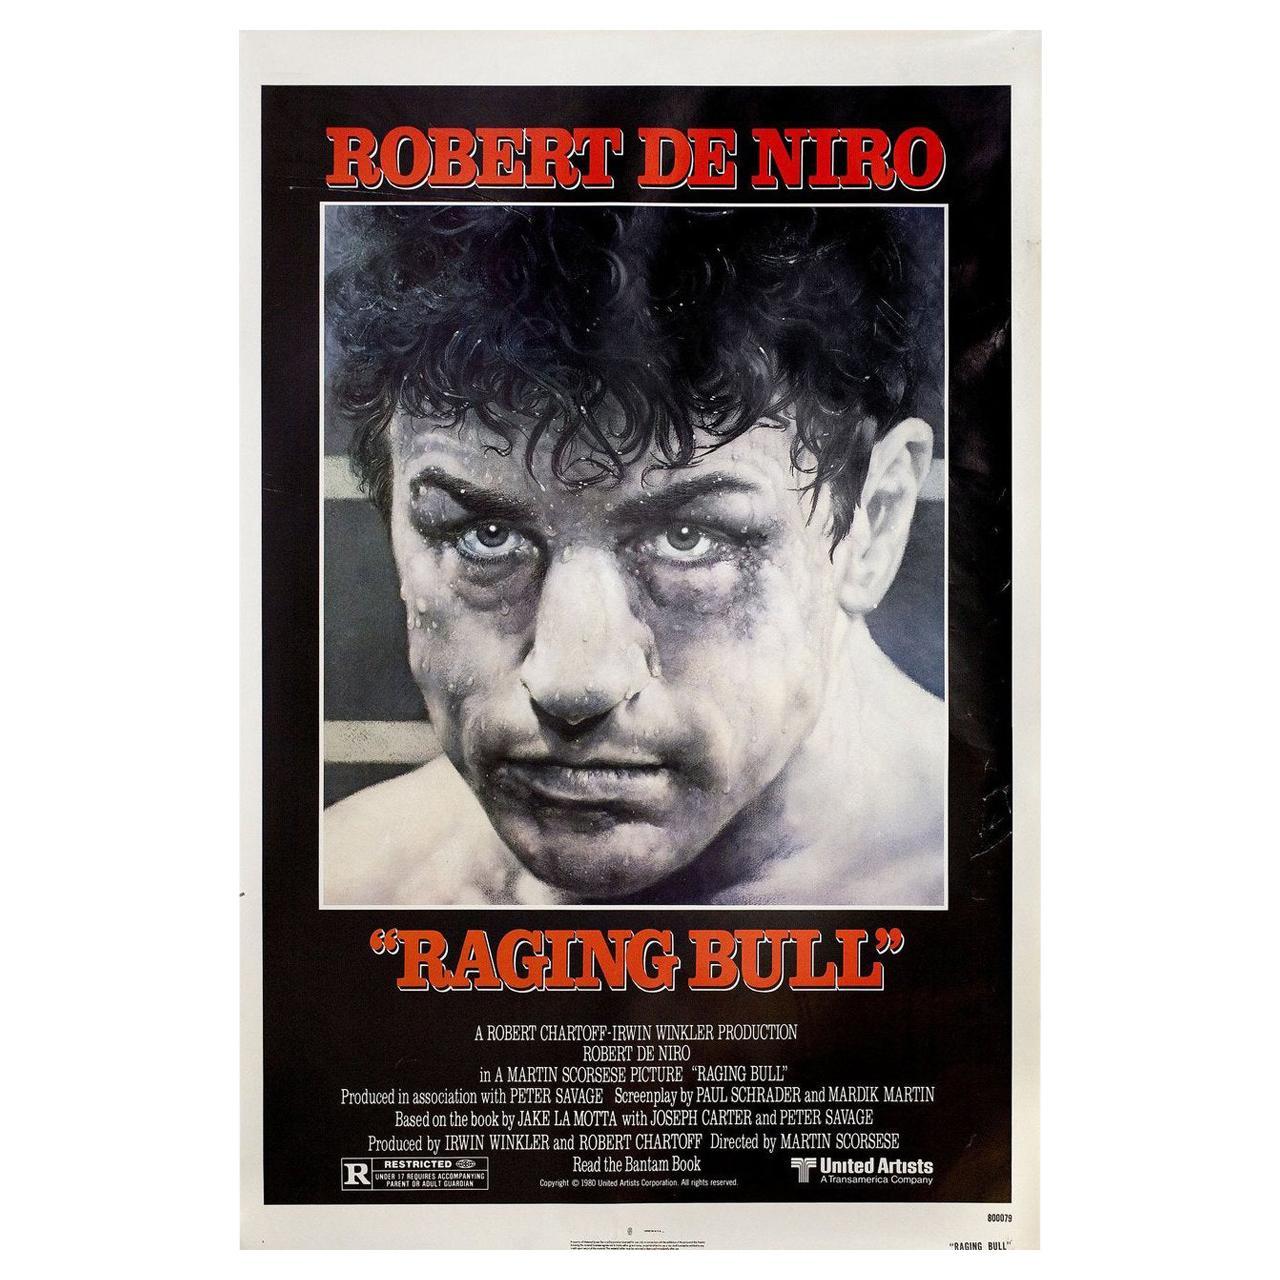 'Raging Bull' 1980 U.S. One Sheet Film Poster